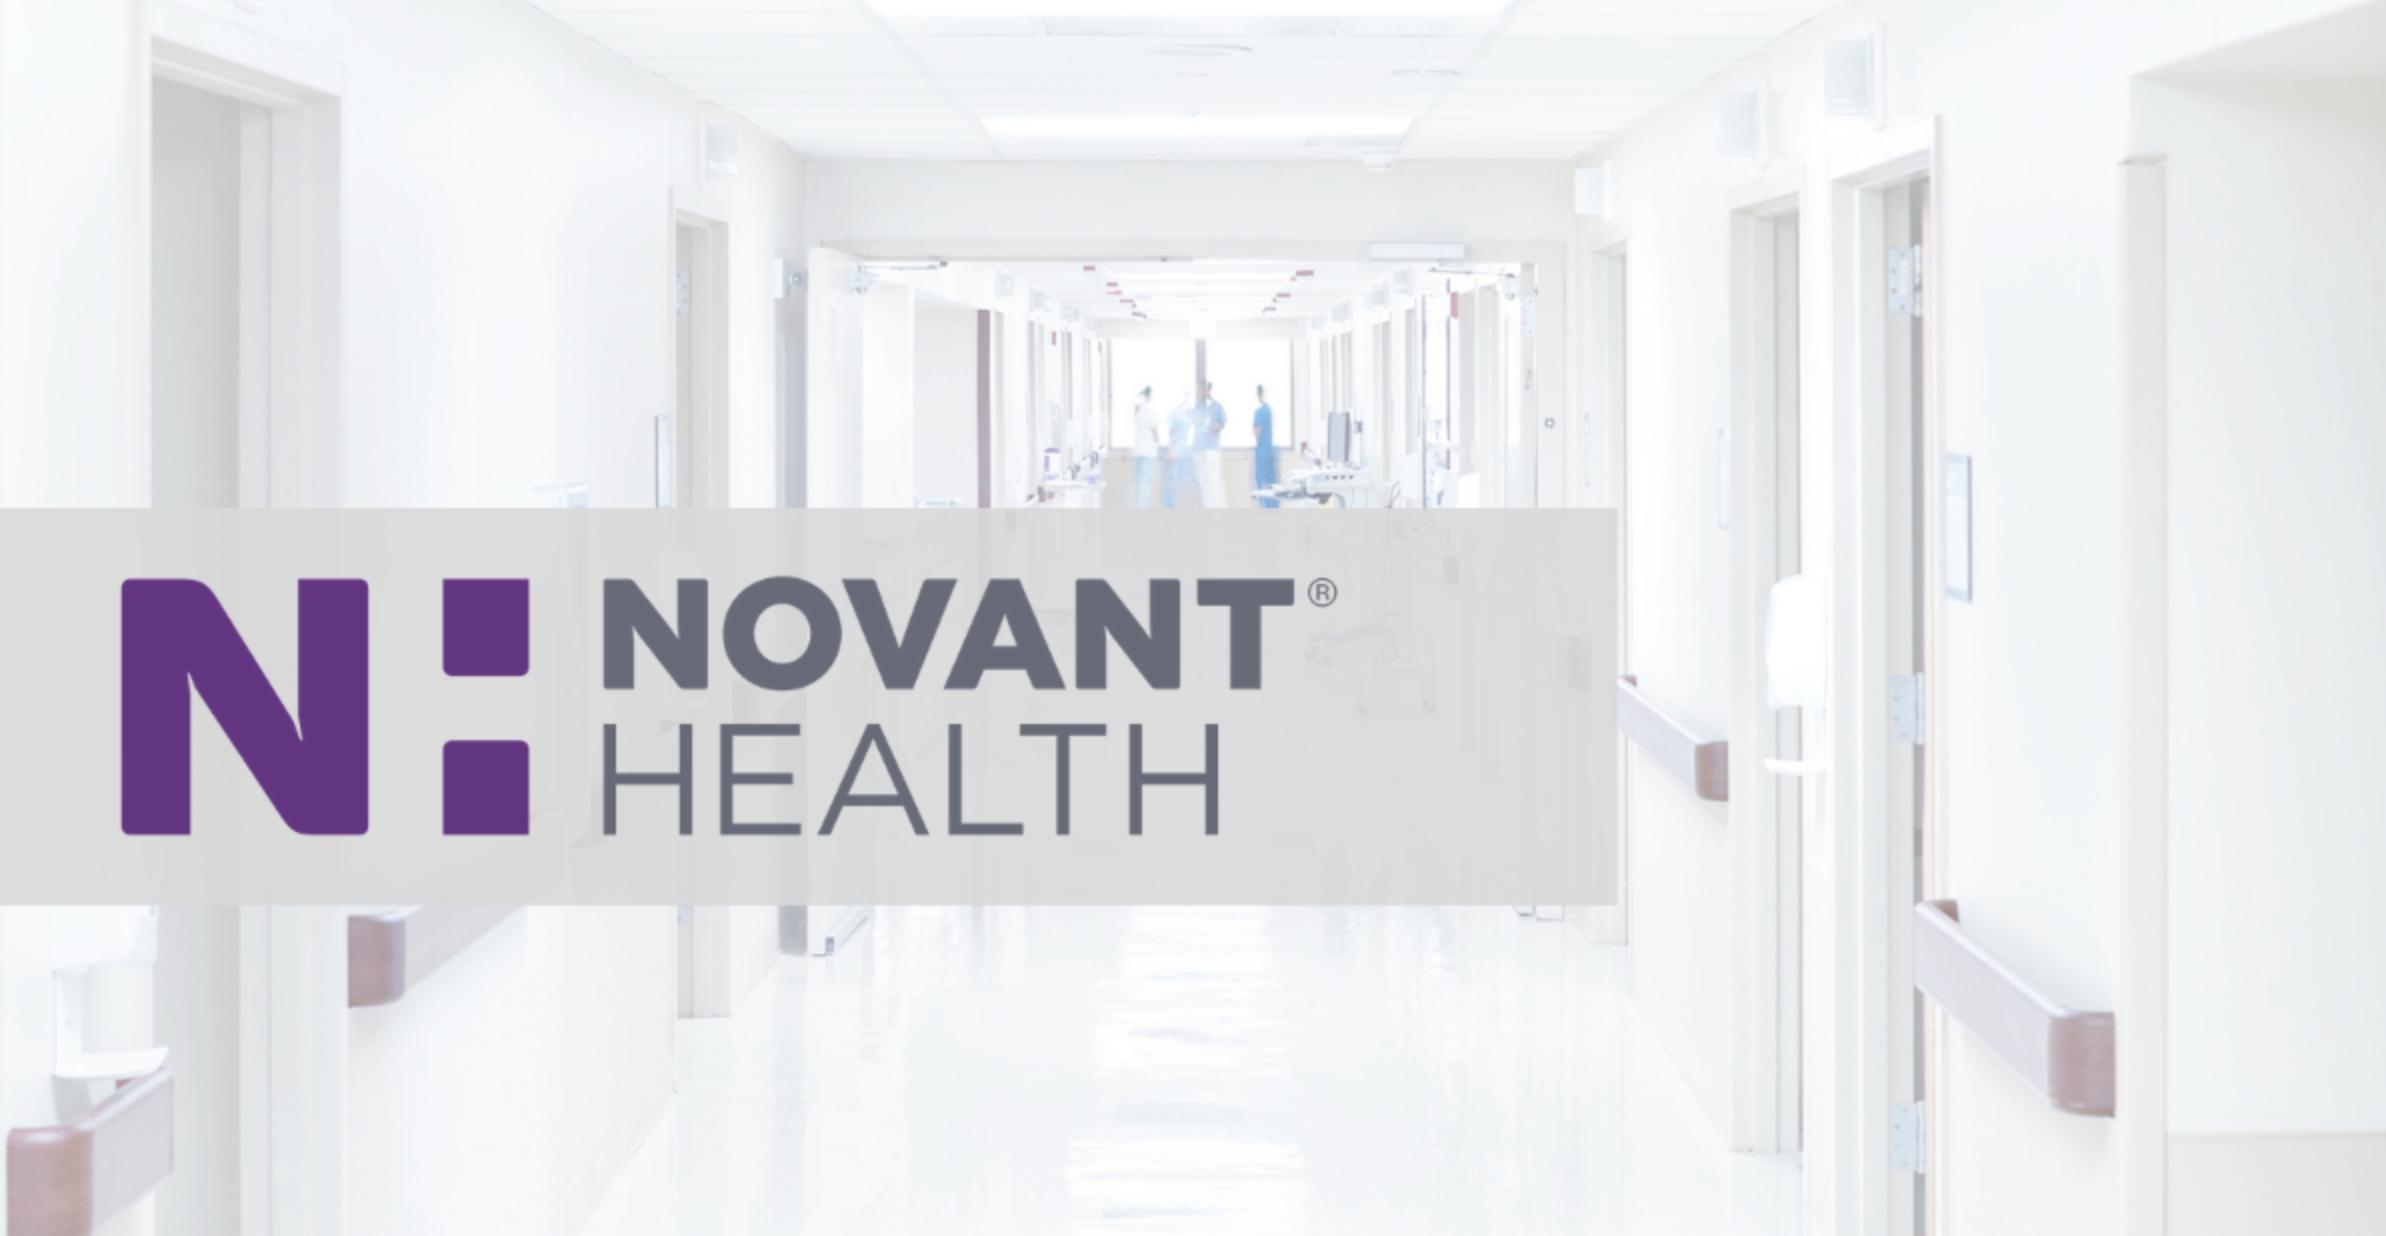 Novant Health Resource Image